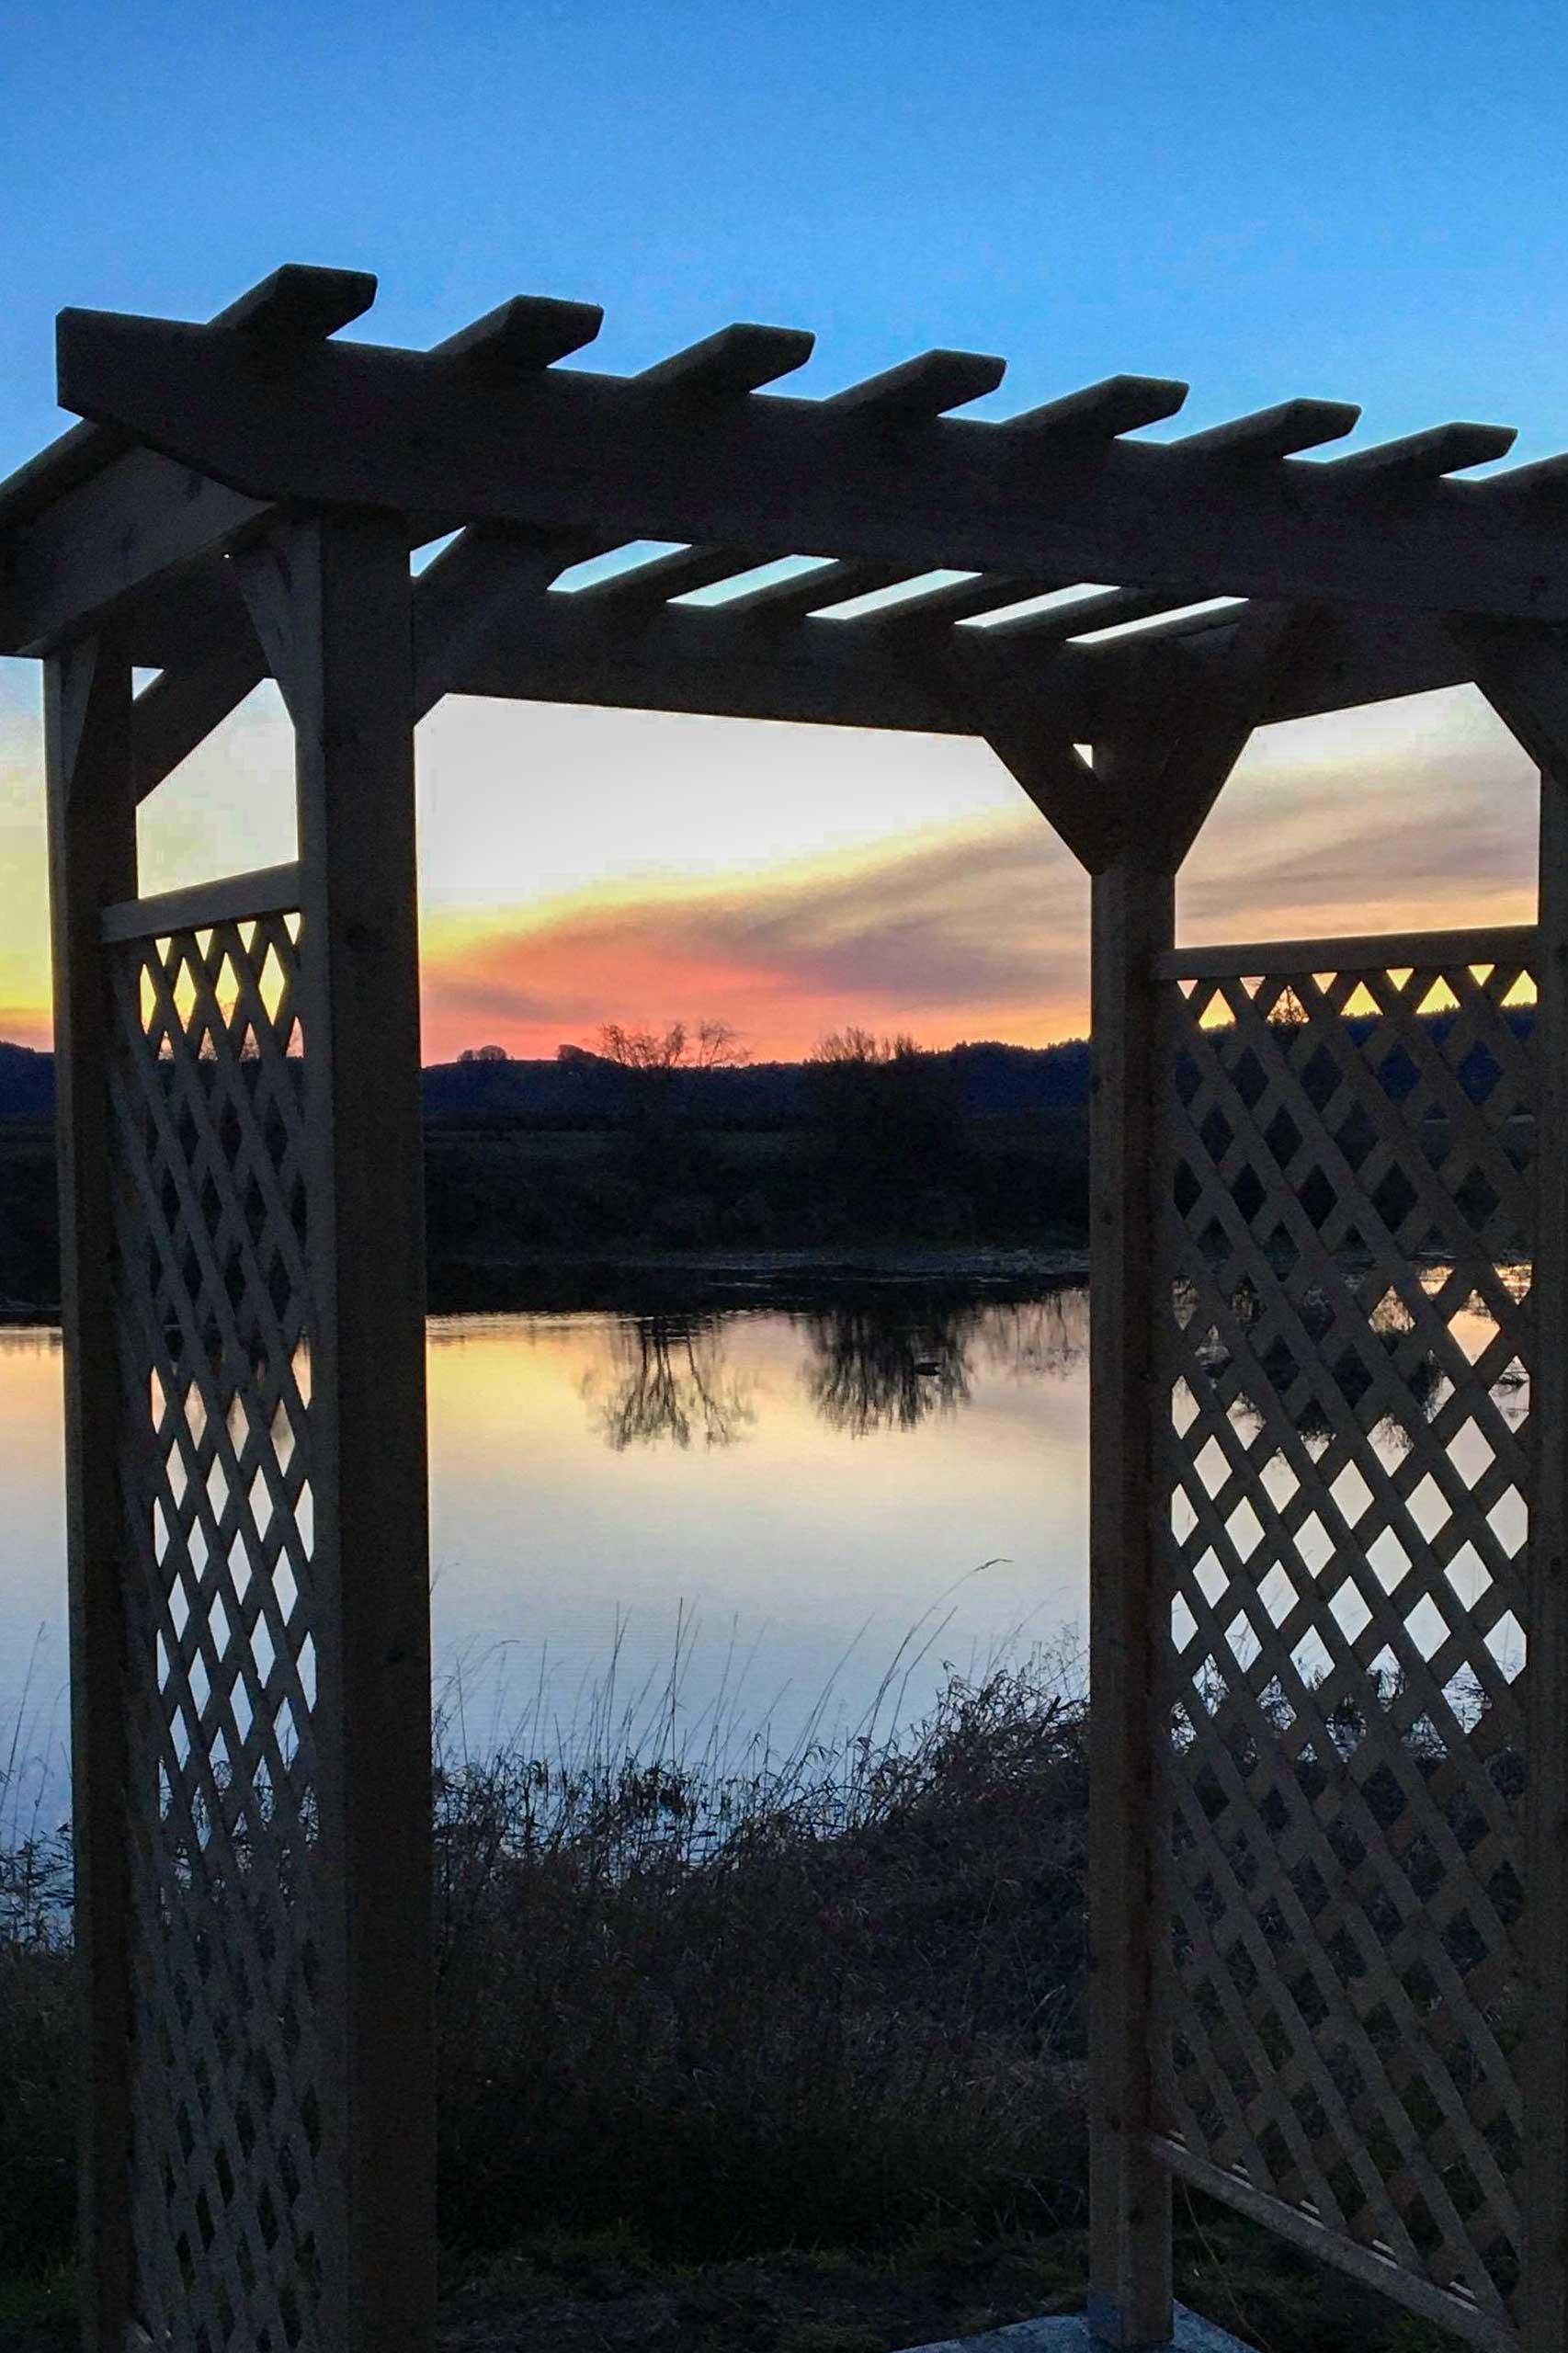 Water/Sunset Views